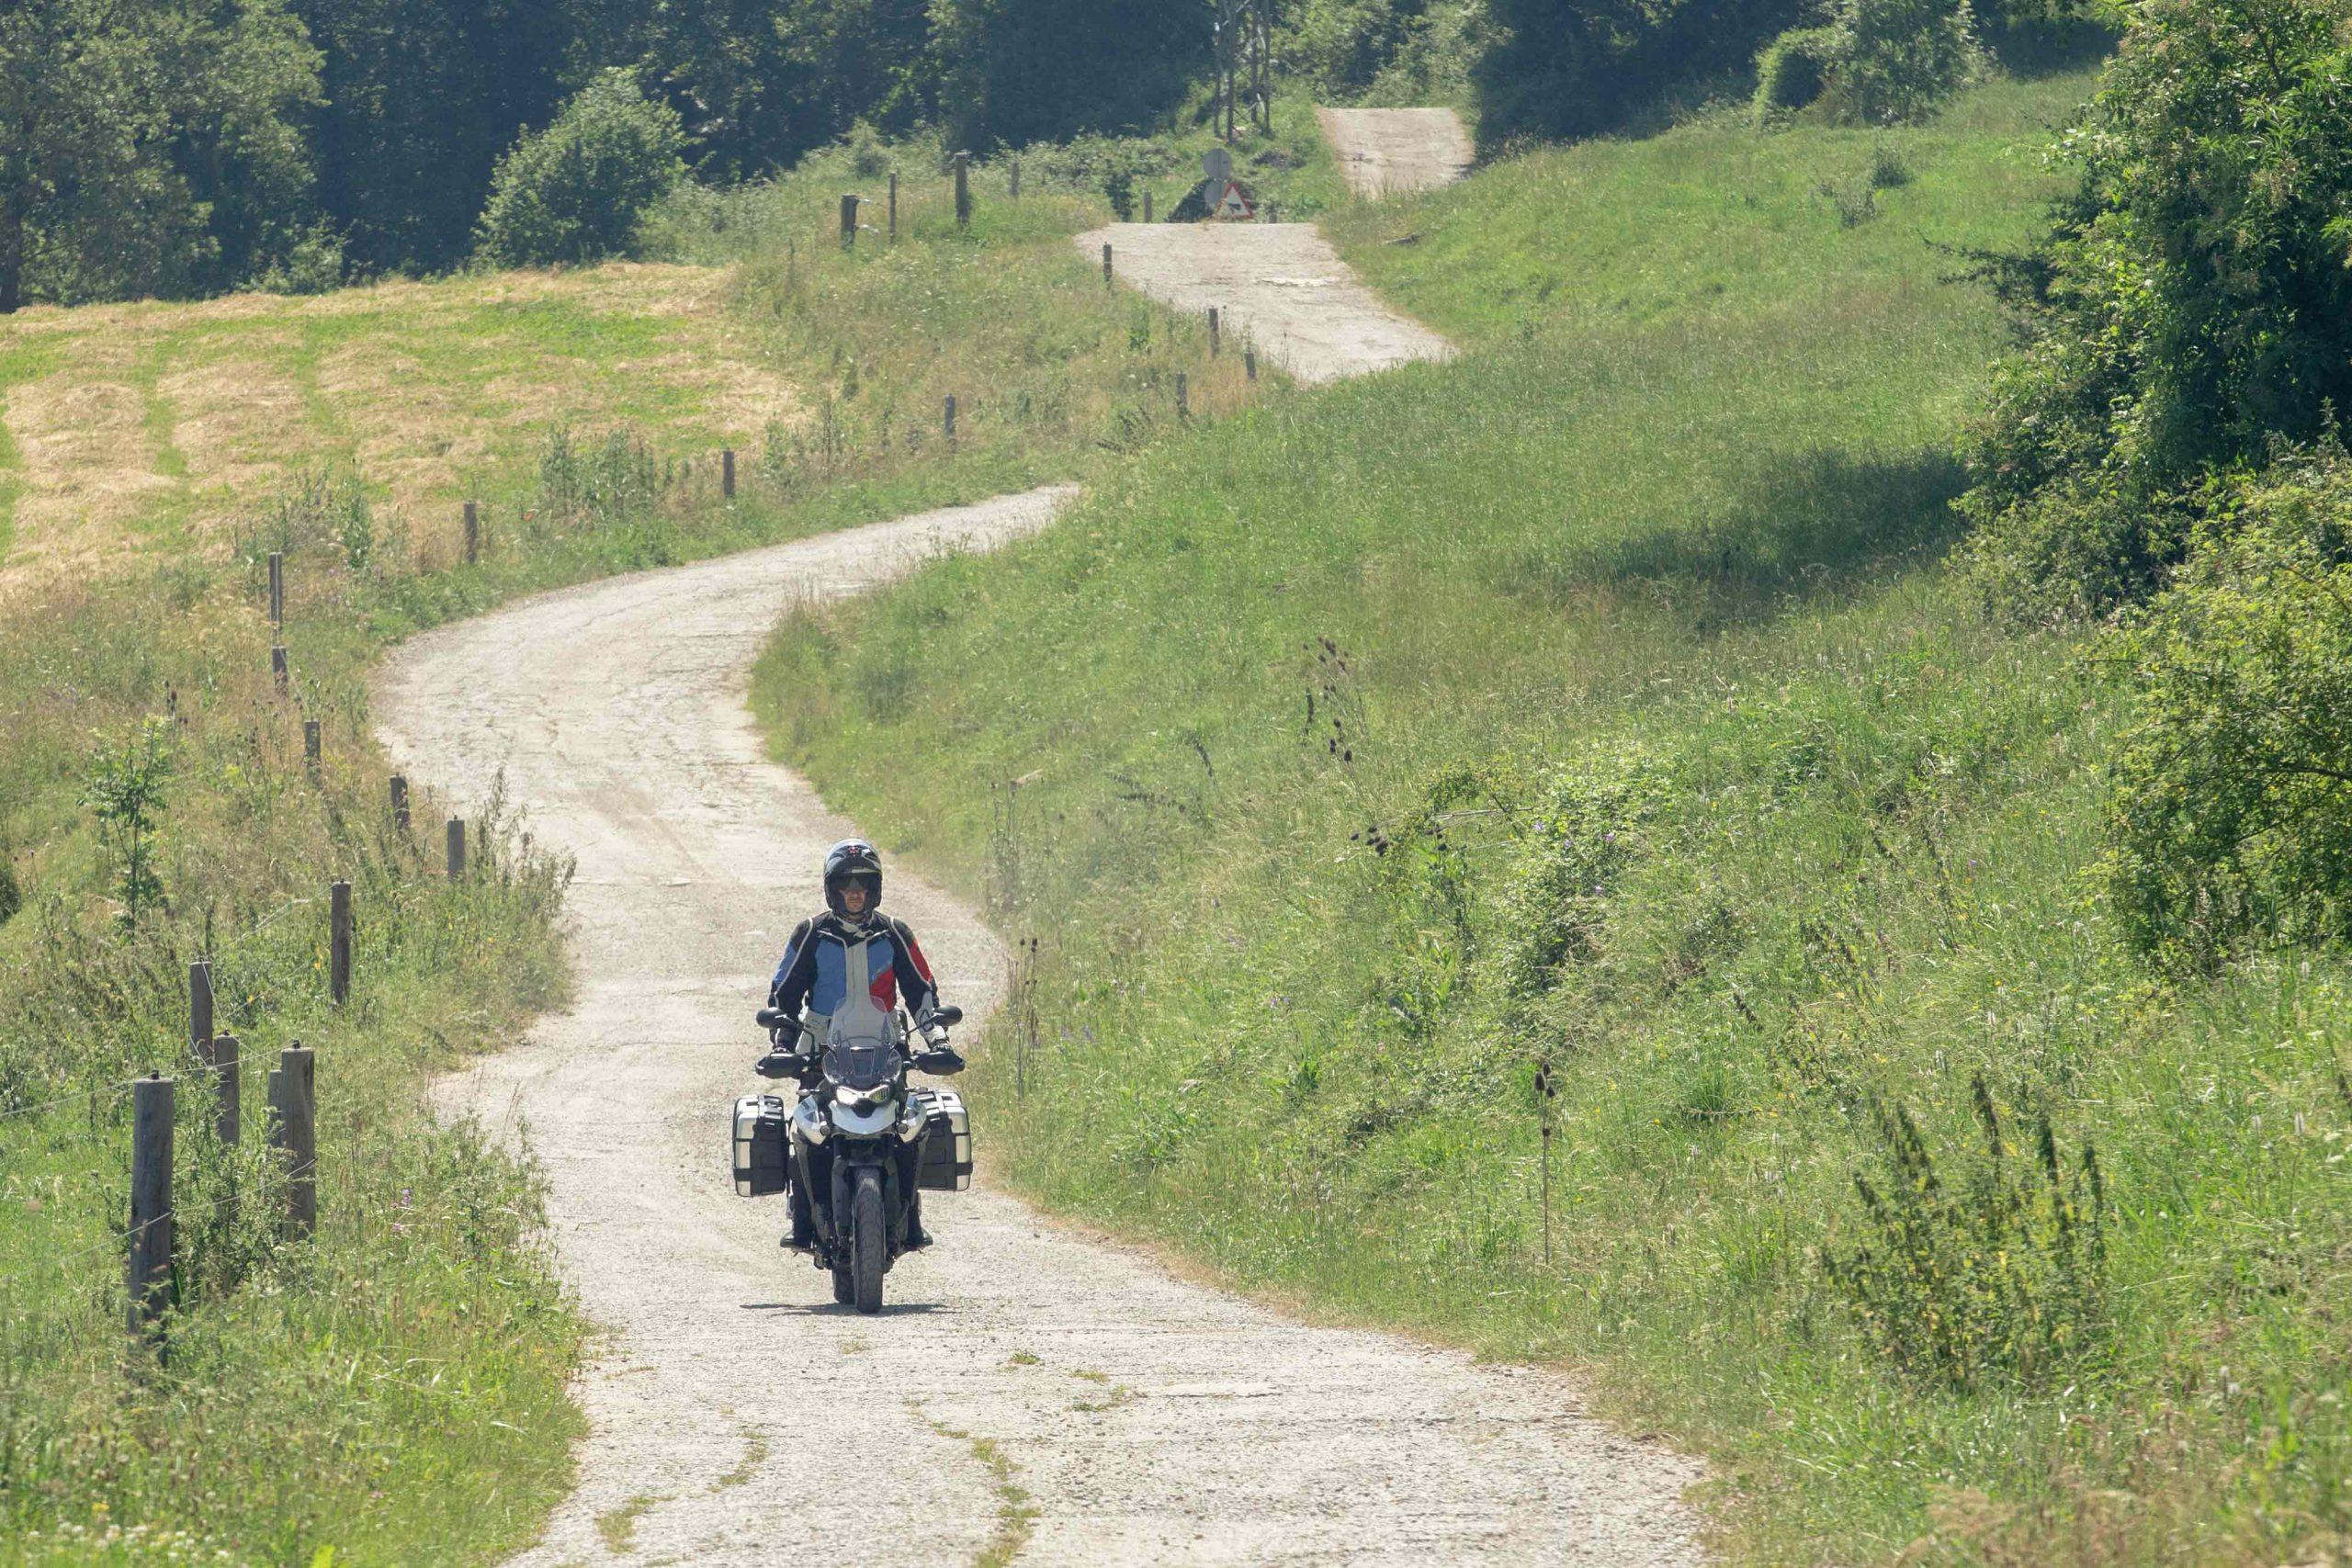 012_TriumphTiger-motosnet-mariapujol-fotografobarcelona